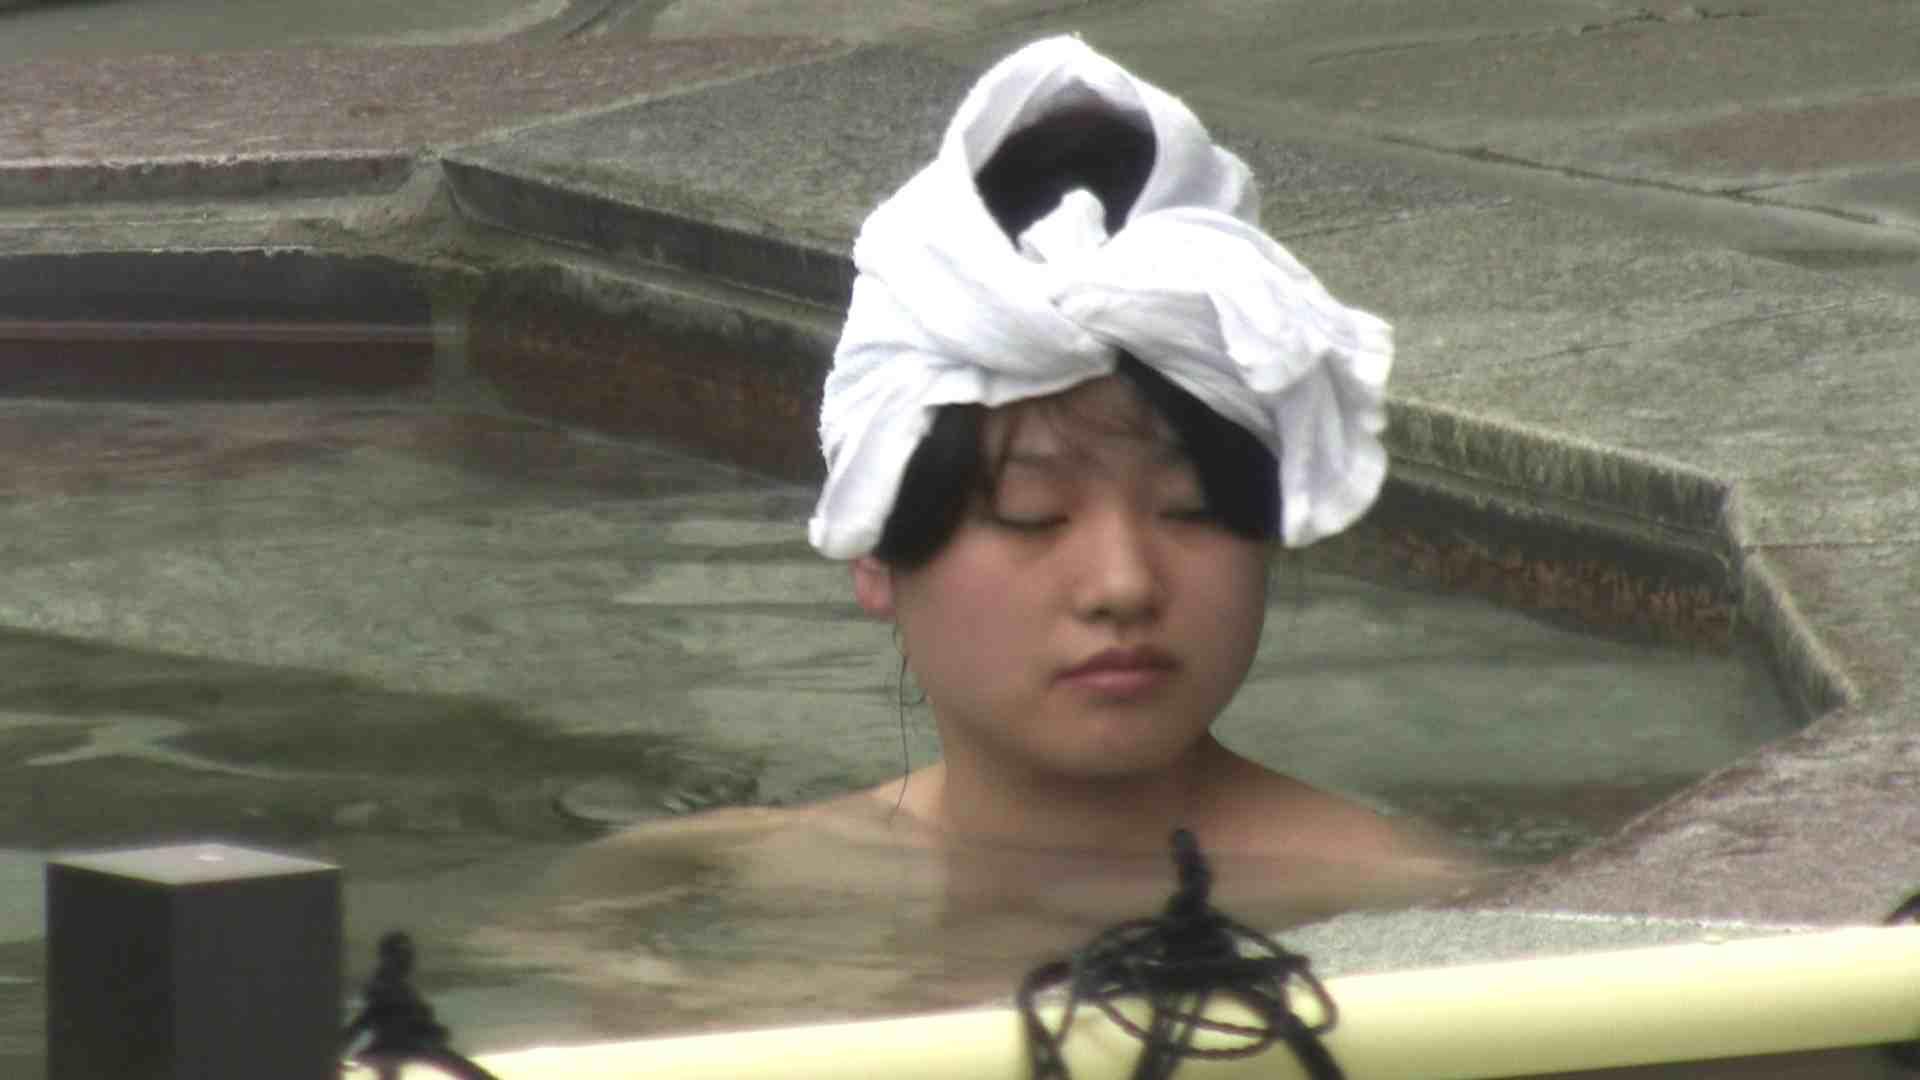 Aquaな露天風呂Vol.185 盗撮   HなOL  102pic 94